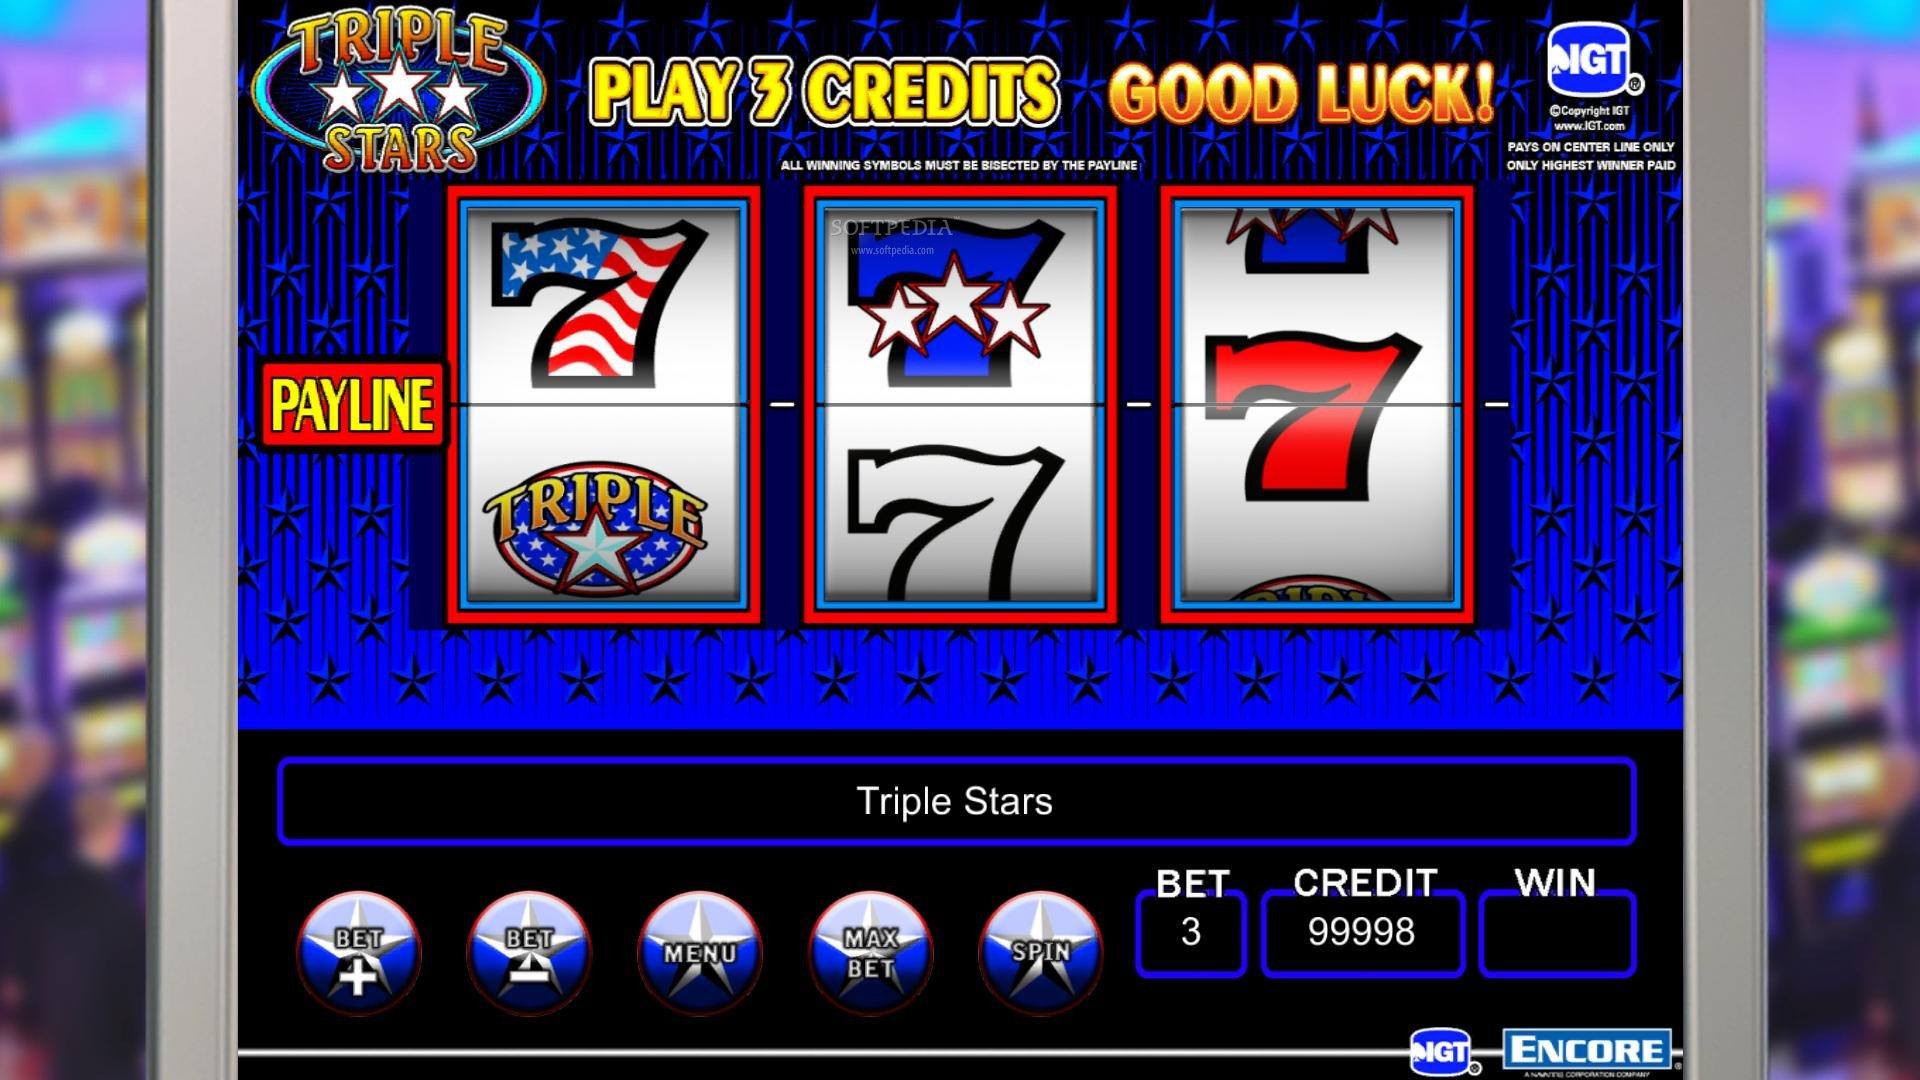 Wizard of odds play blackjack